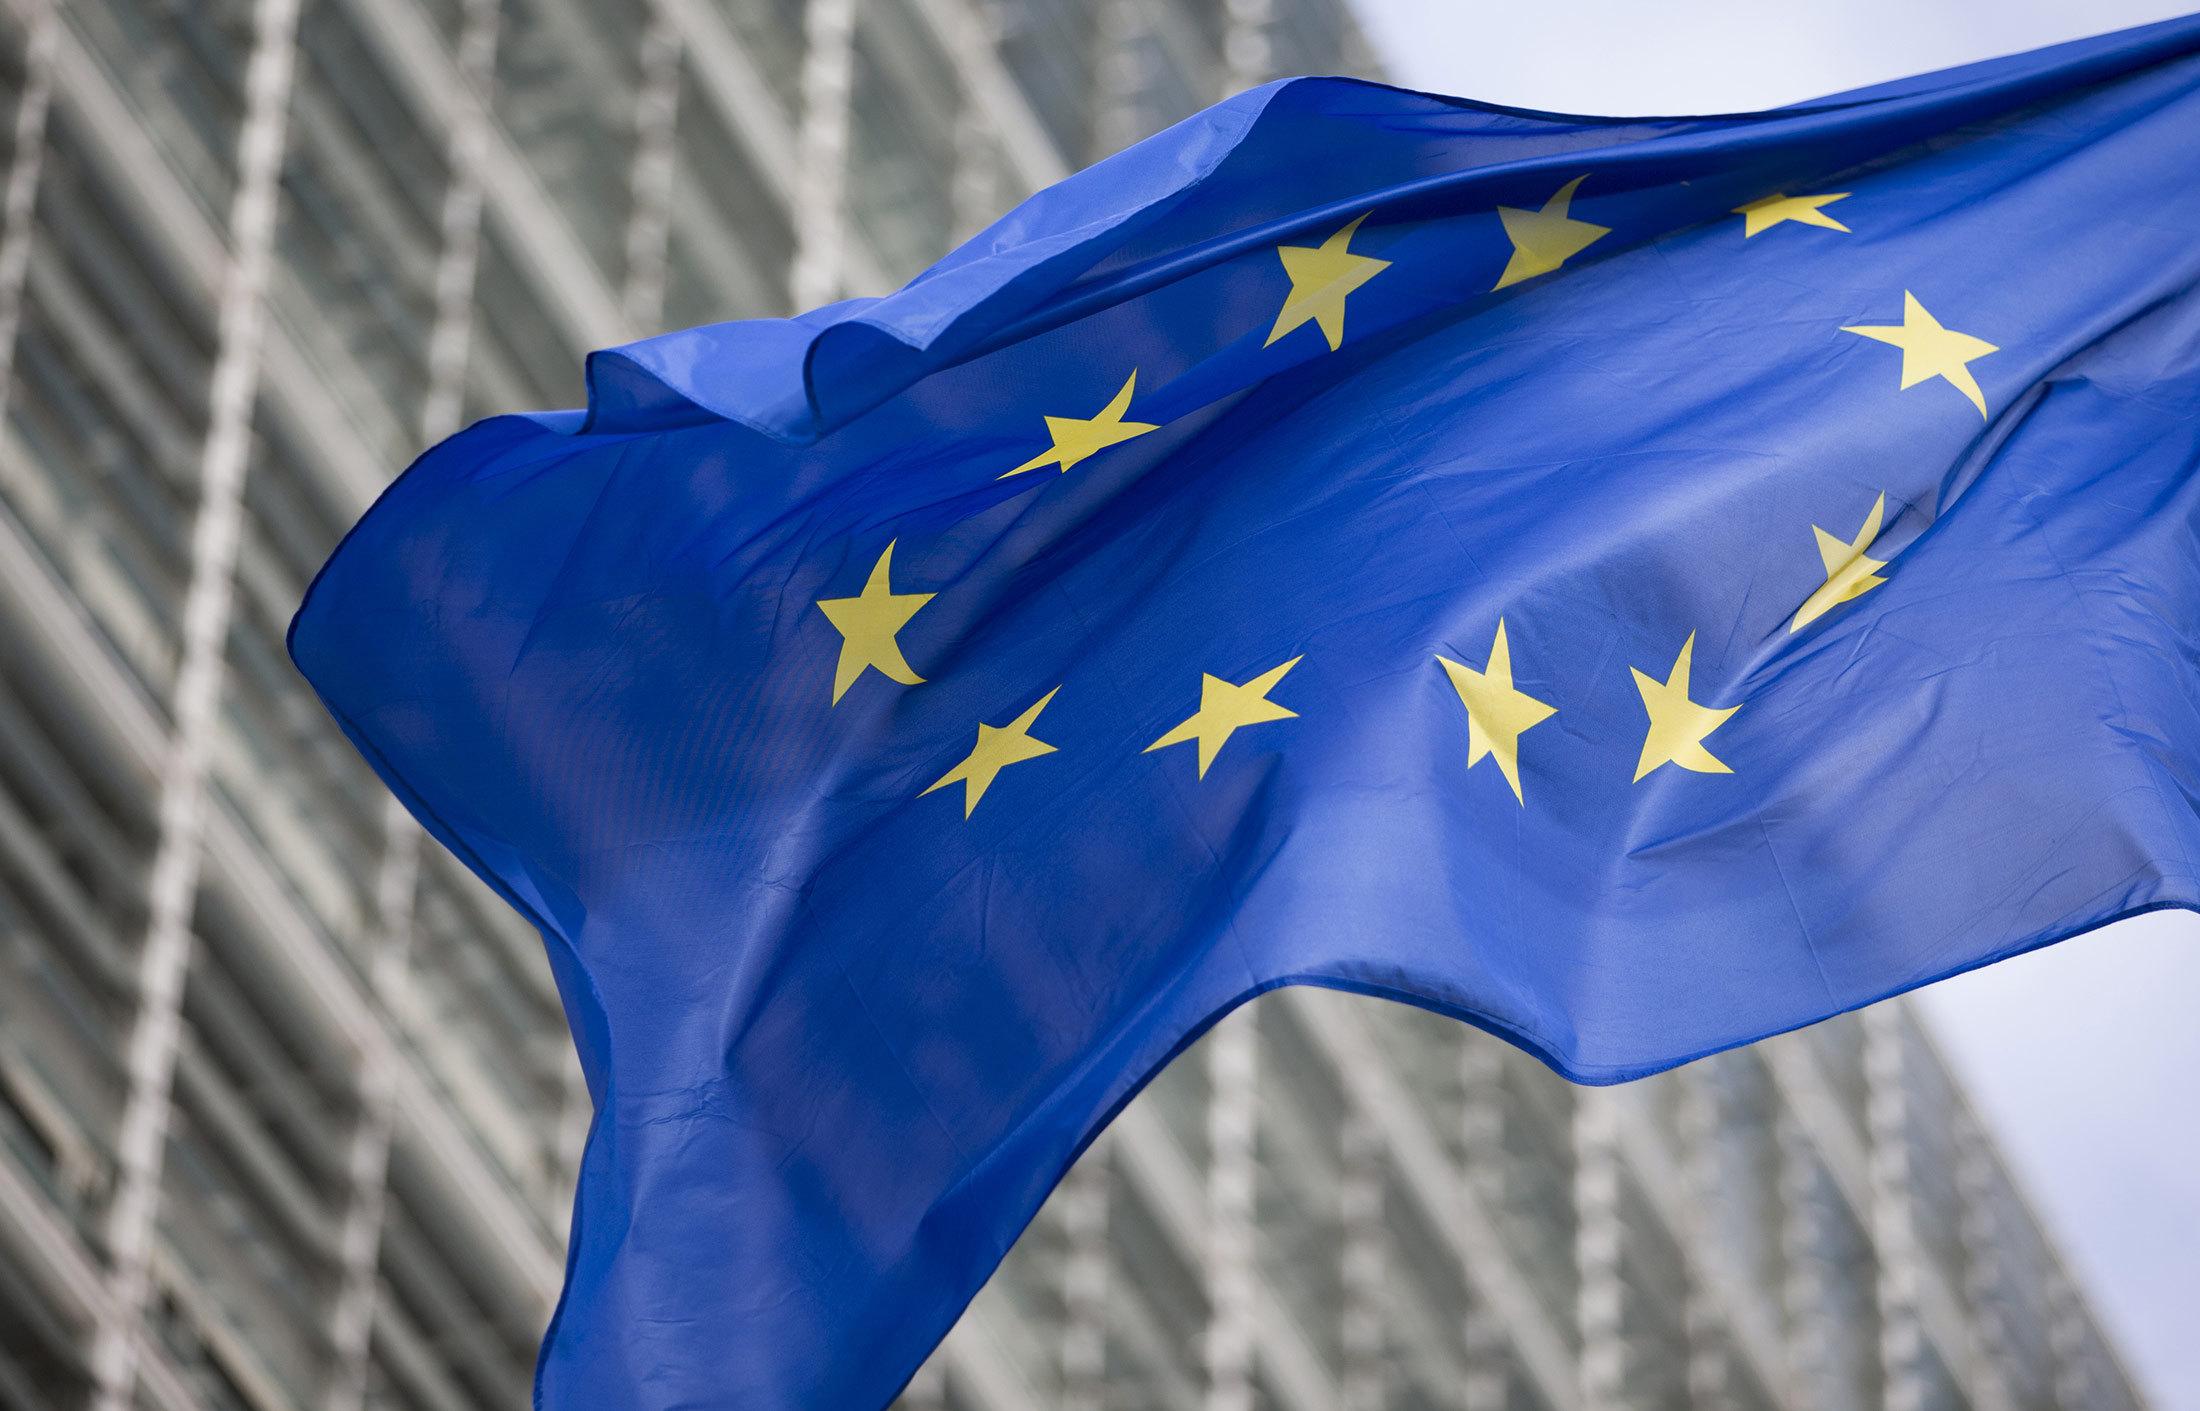 https://assets.sourcemedia.com/aa/11/36cd208f4fbea91553ad3c73c181/eu-flag.jpg